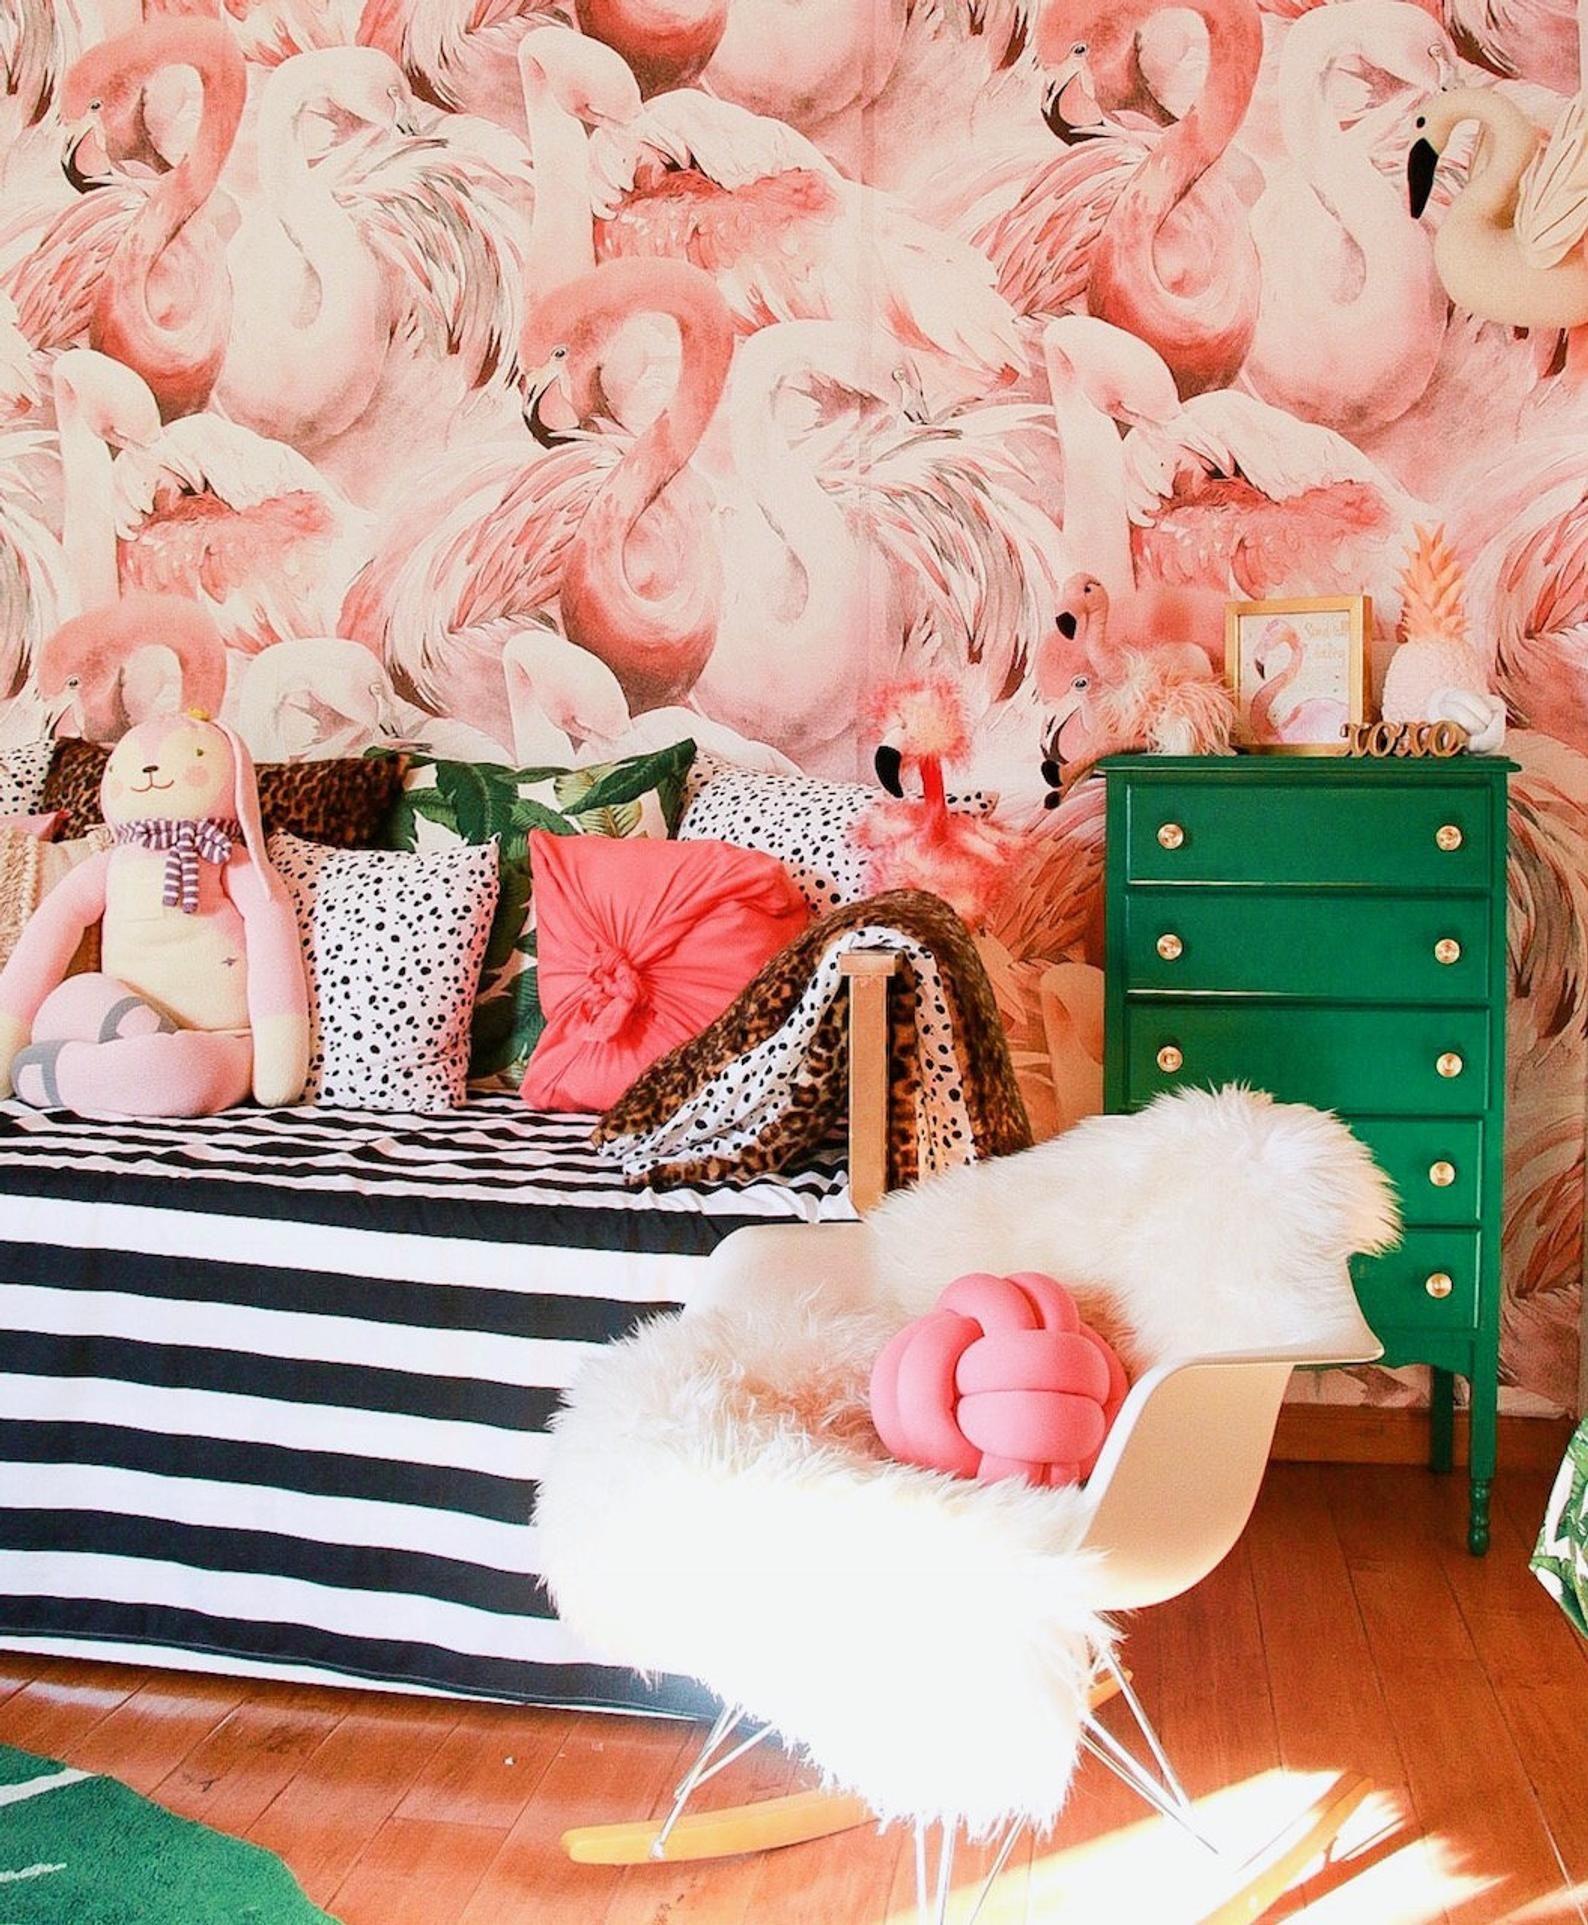 Flamingo Wallpaper Tropical Pink Wall Mural Custom Printed Removable Self Adhesive Paper By Coloray 45 Flamingo Wallpaper Pink Walls Removable Wall Murals